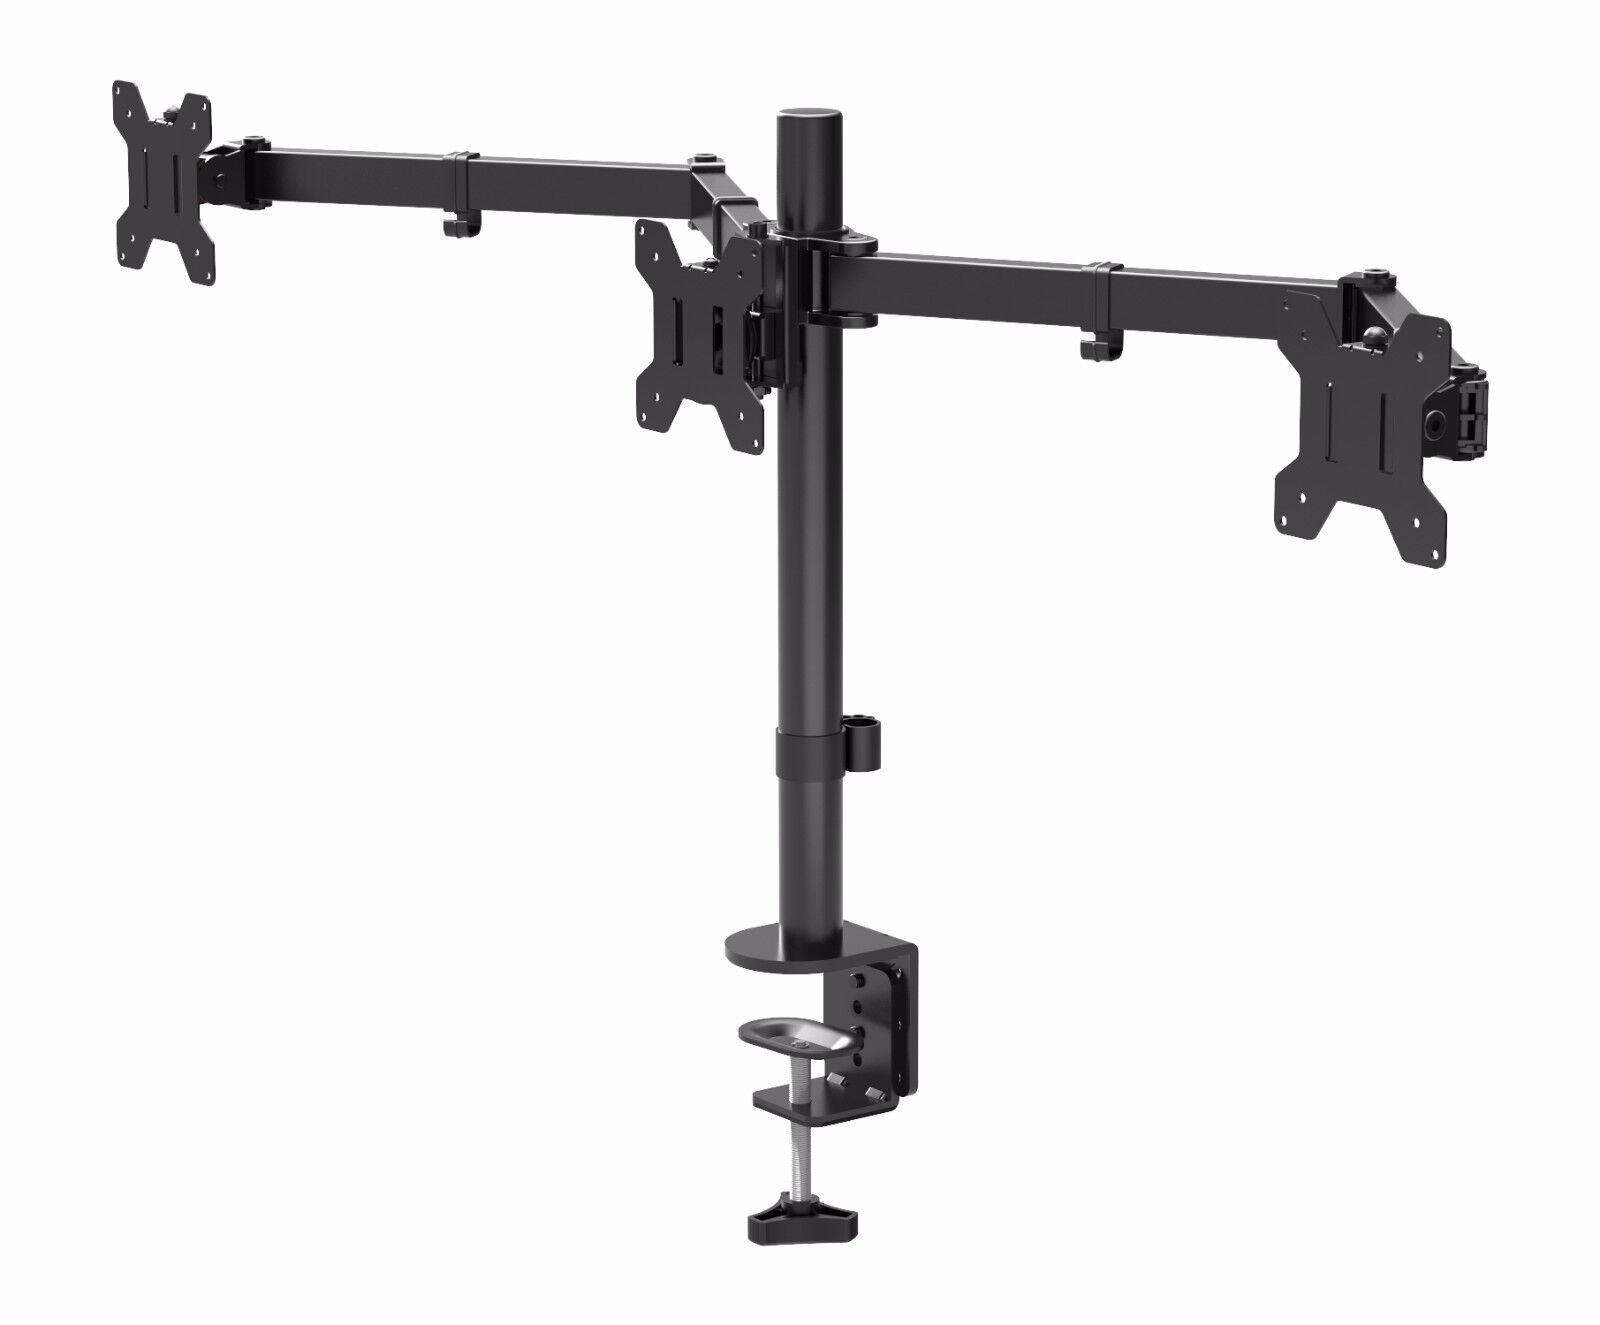 Triple Arm Desk Mount Lcd Led Computer Monitor Bracket